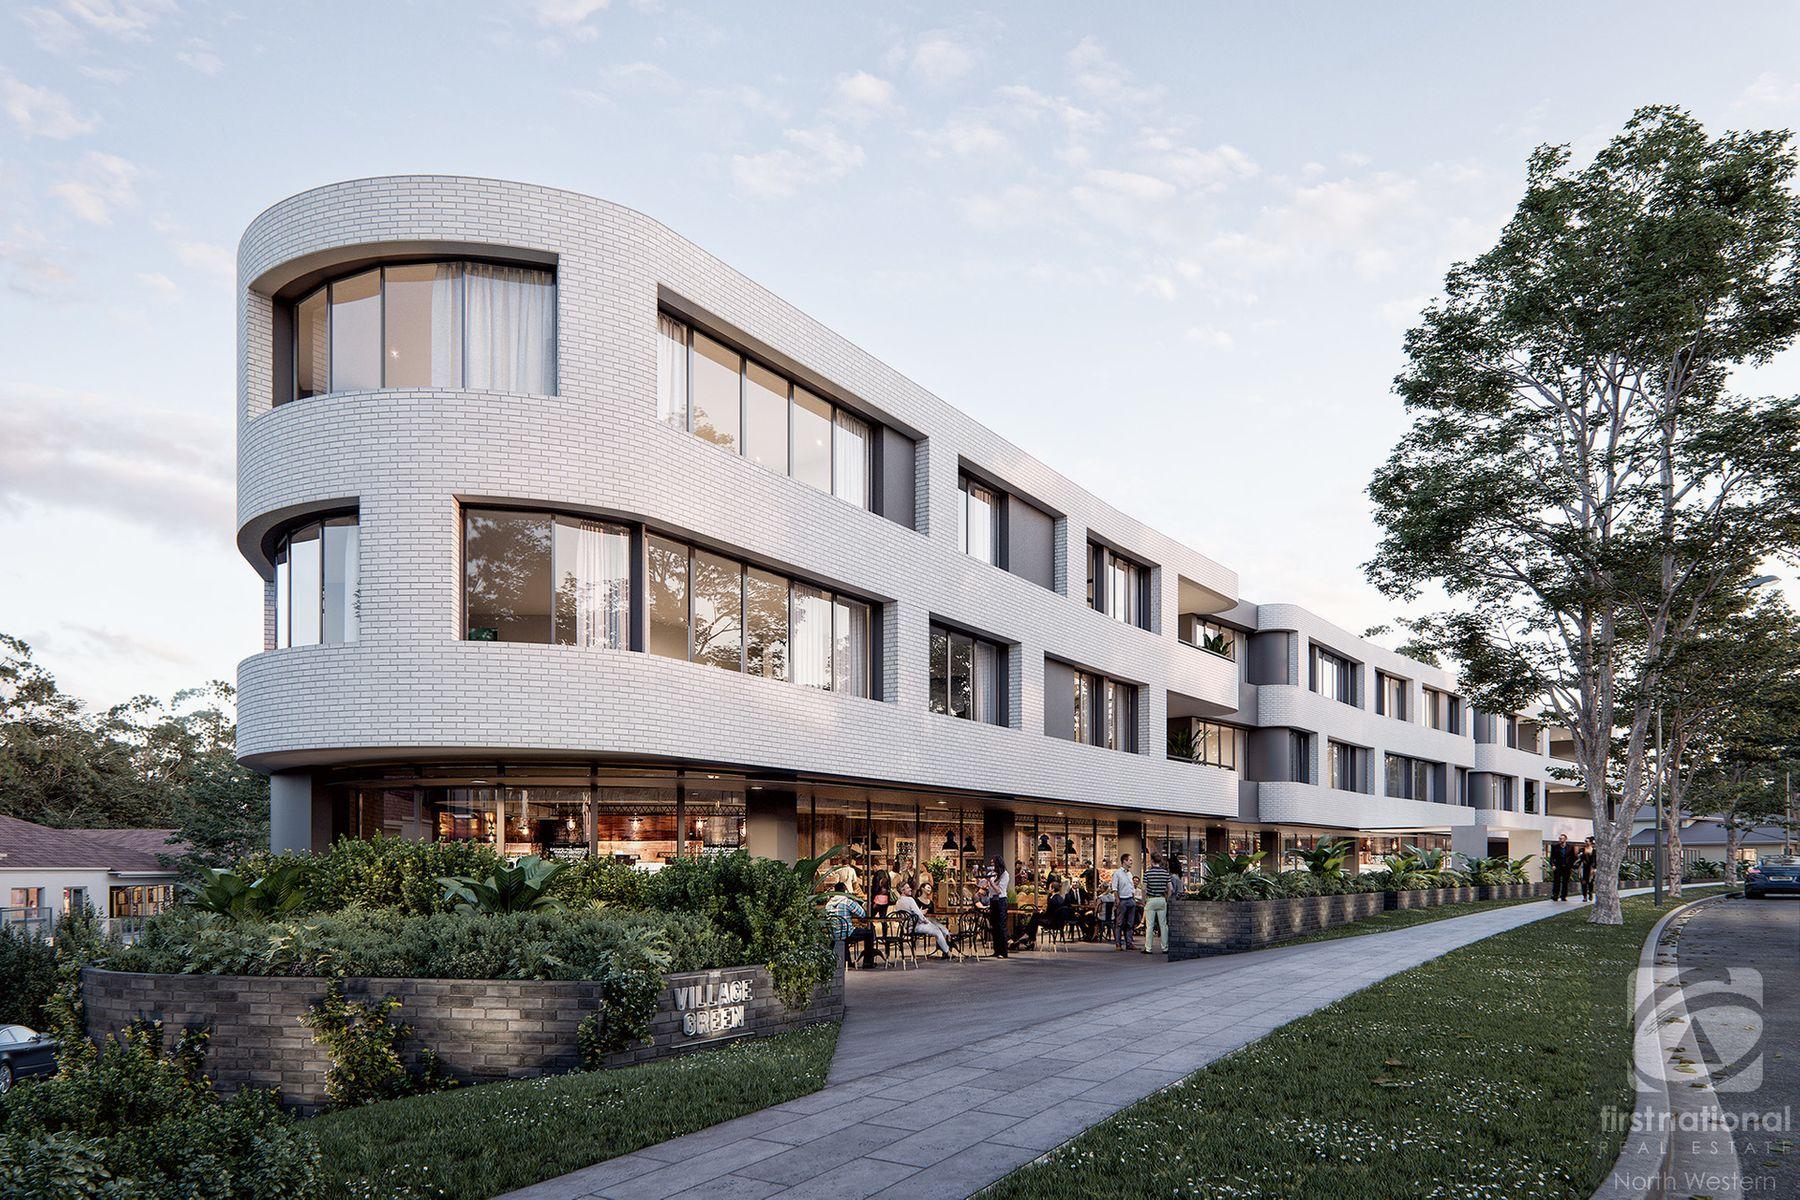 3/105 Bella Vista Drive, Bella Vista, NSW 2153